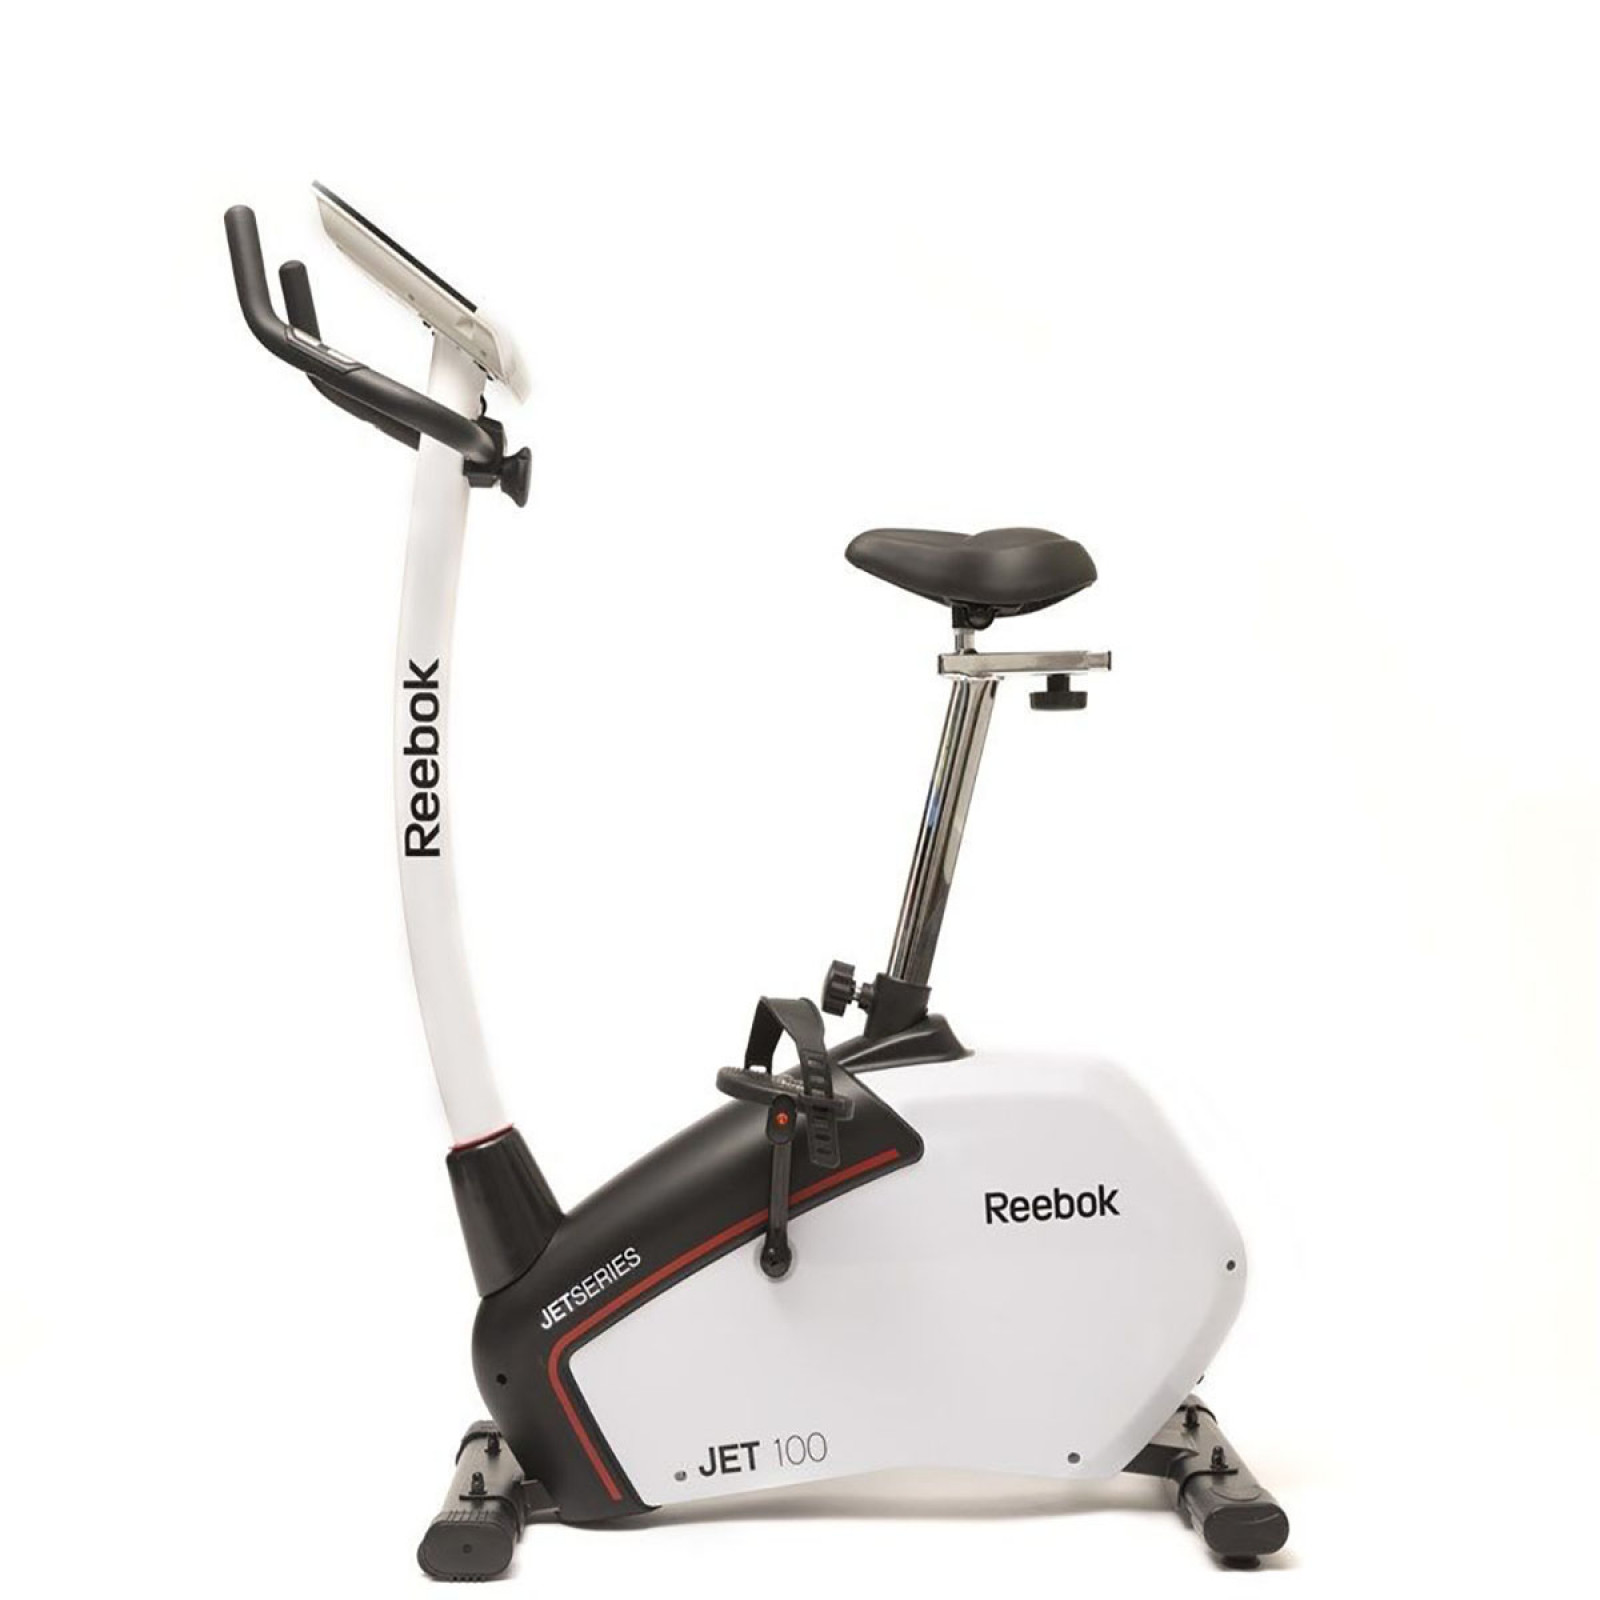 reebok jet 100 s exercise bike